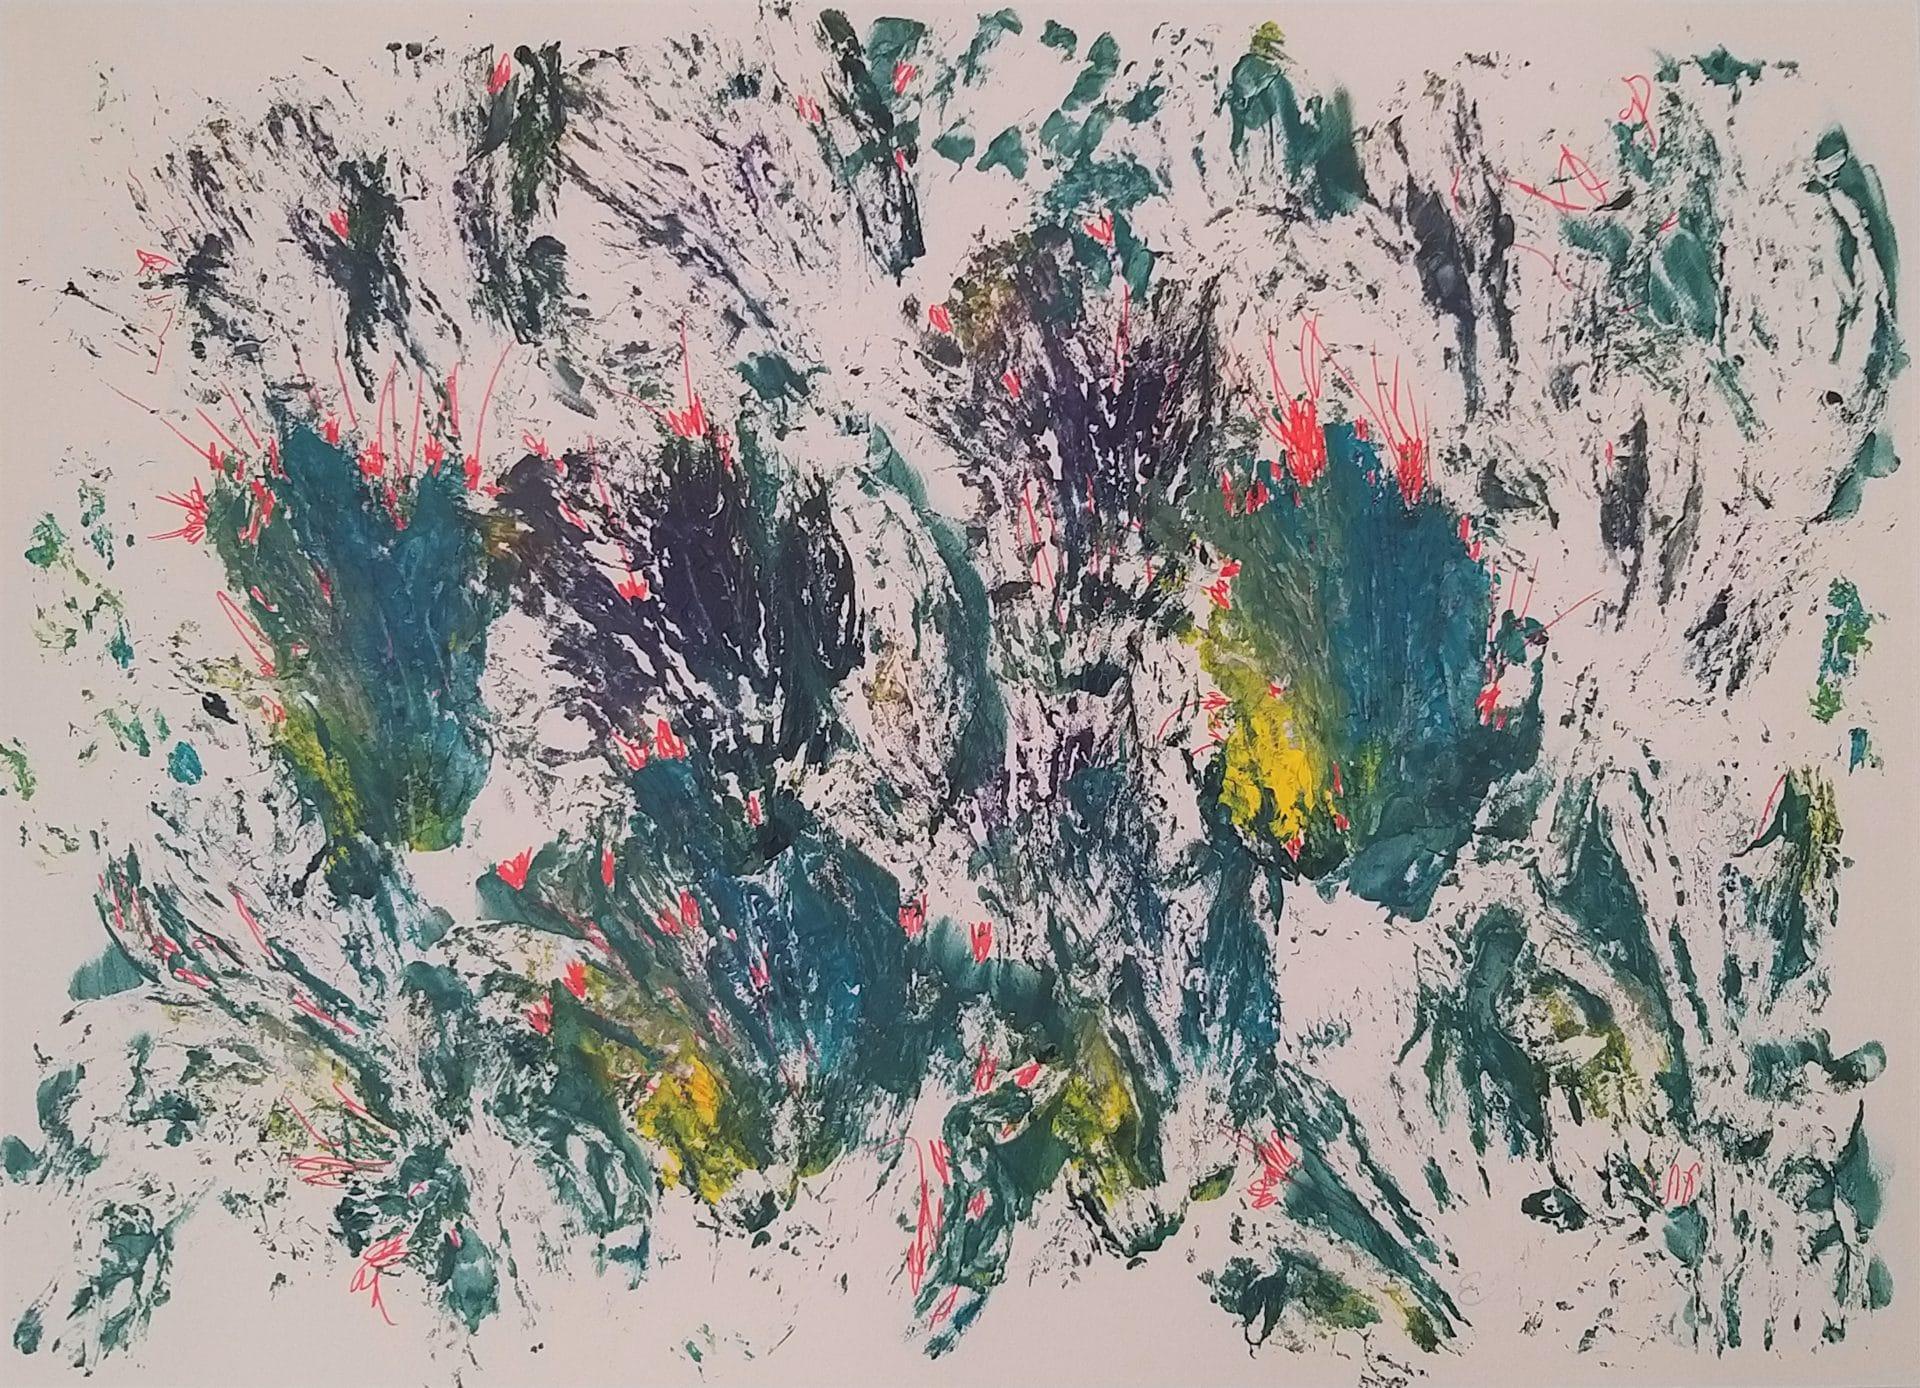 Abstract Spring Αφηρημένη Άνοιξη